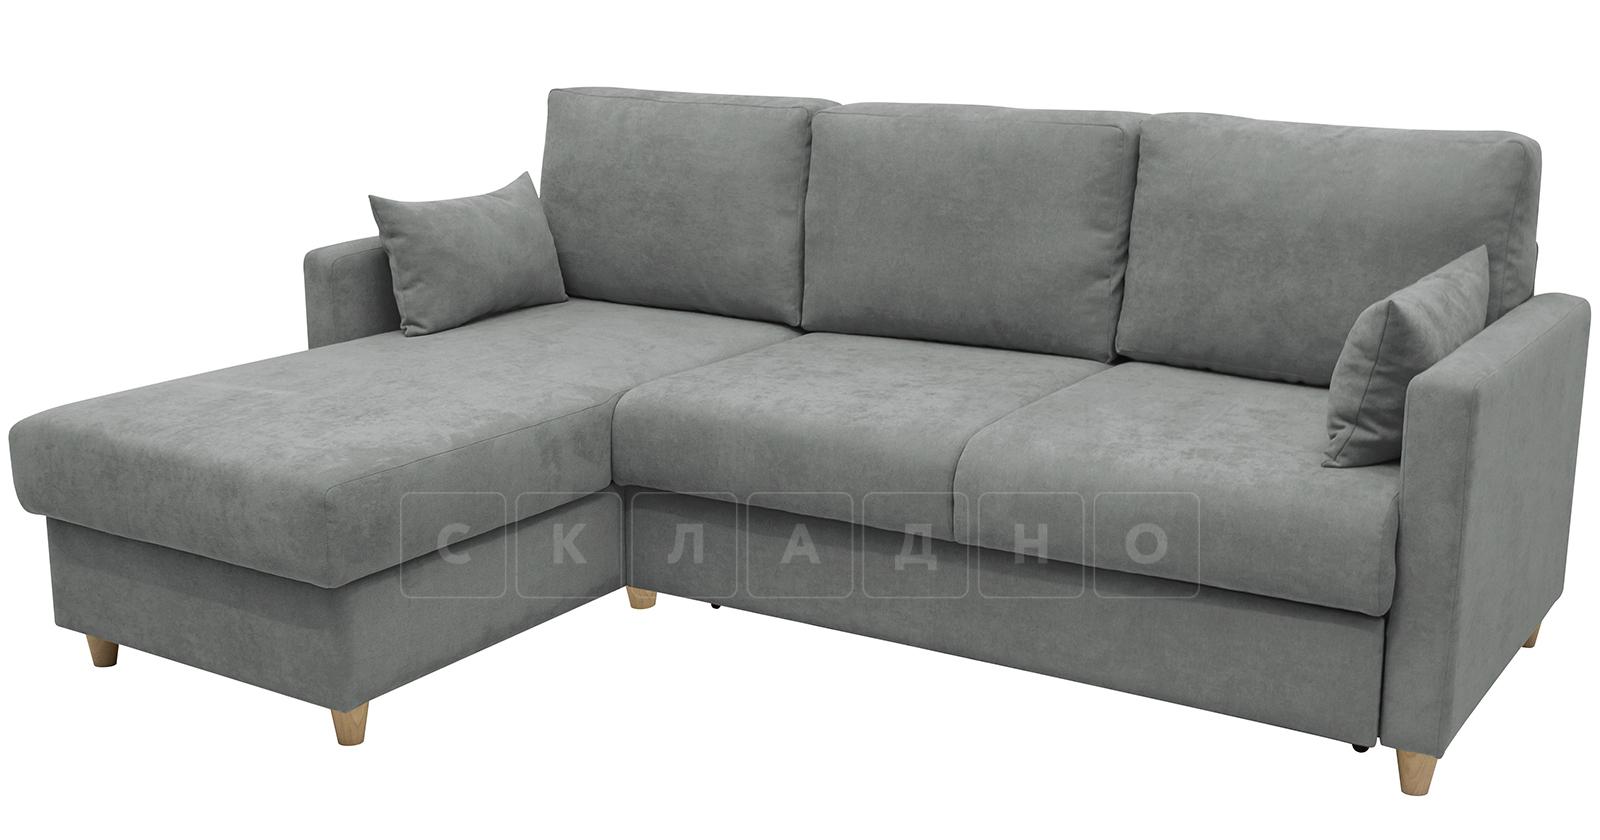 Угловой диван Дарвин серый фото 2 | интернет-магазин Складно